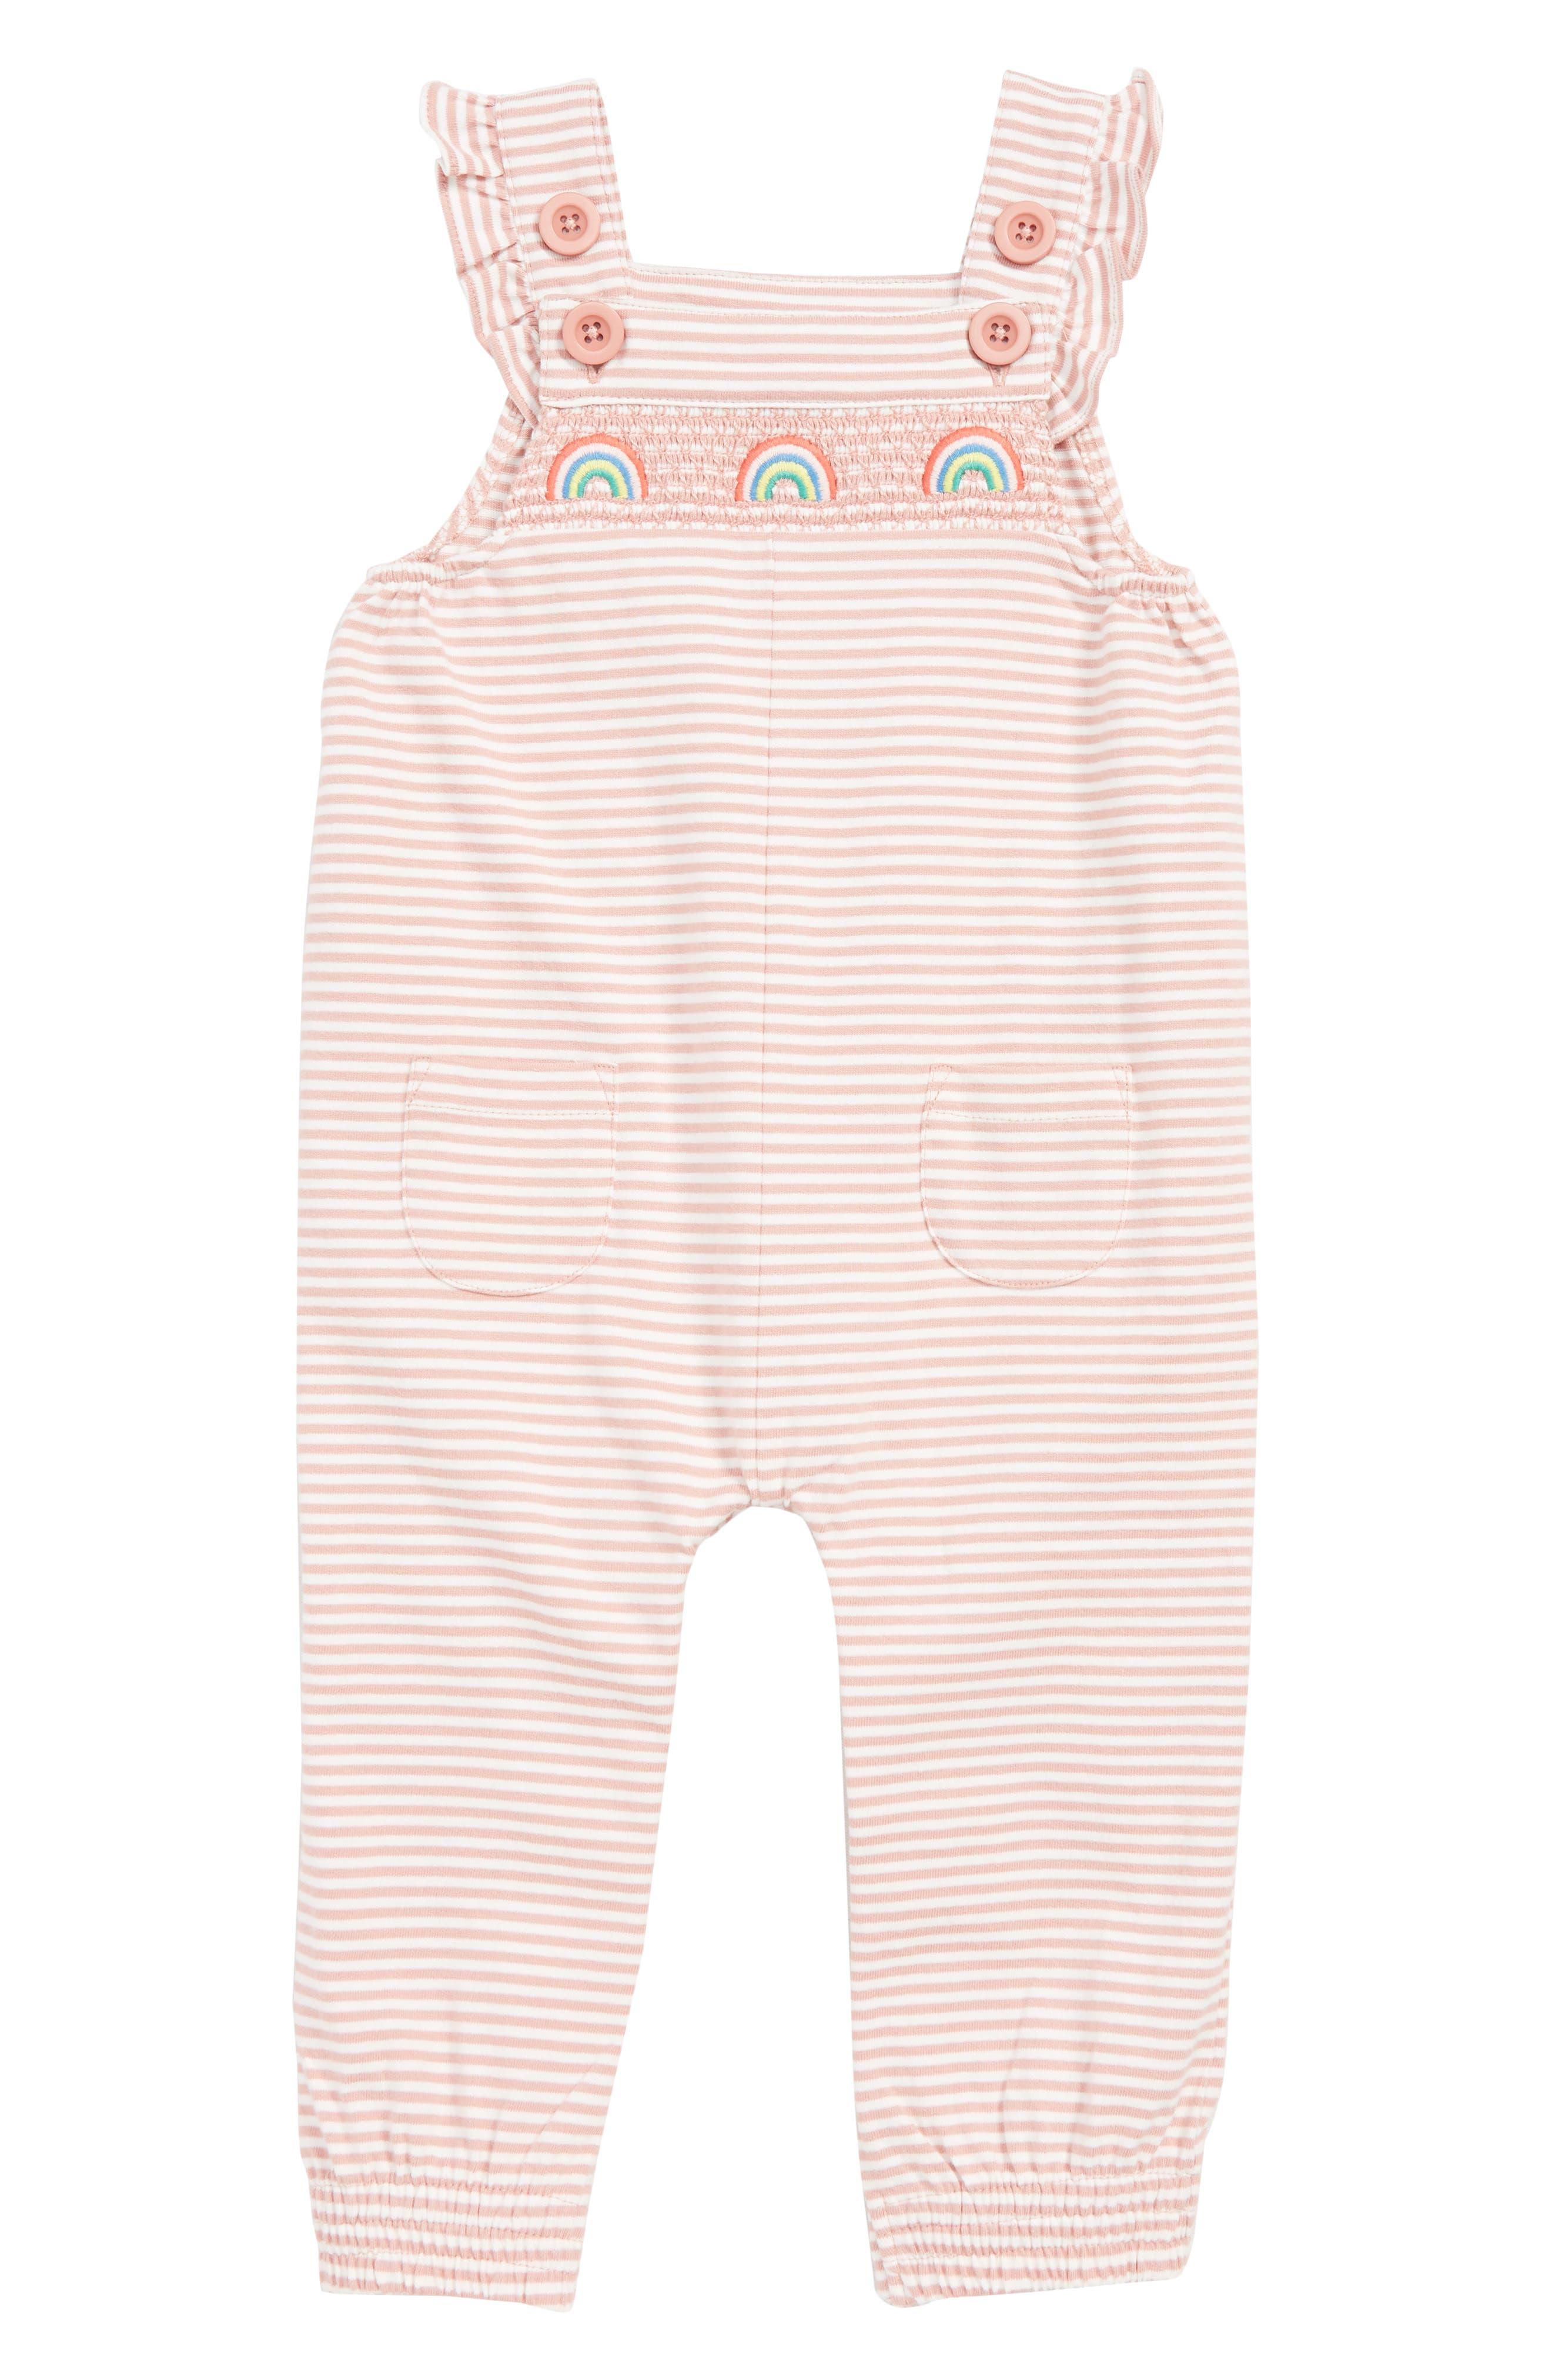 Infant Girls Mini Boden Smocked Rainbow Jersey Romper Size 1824M  Pink